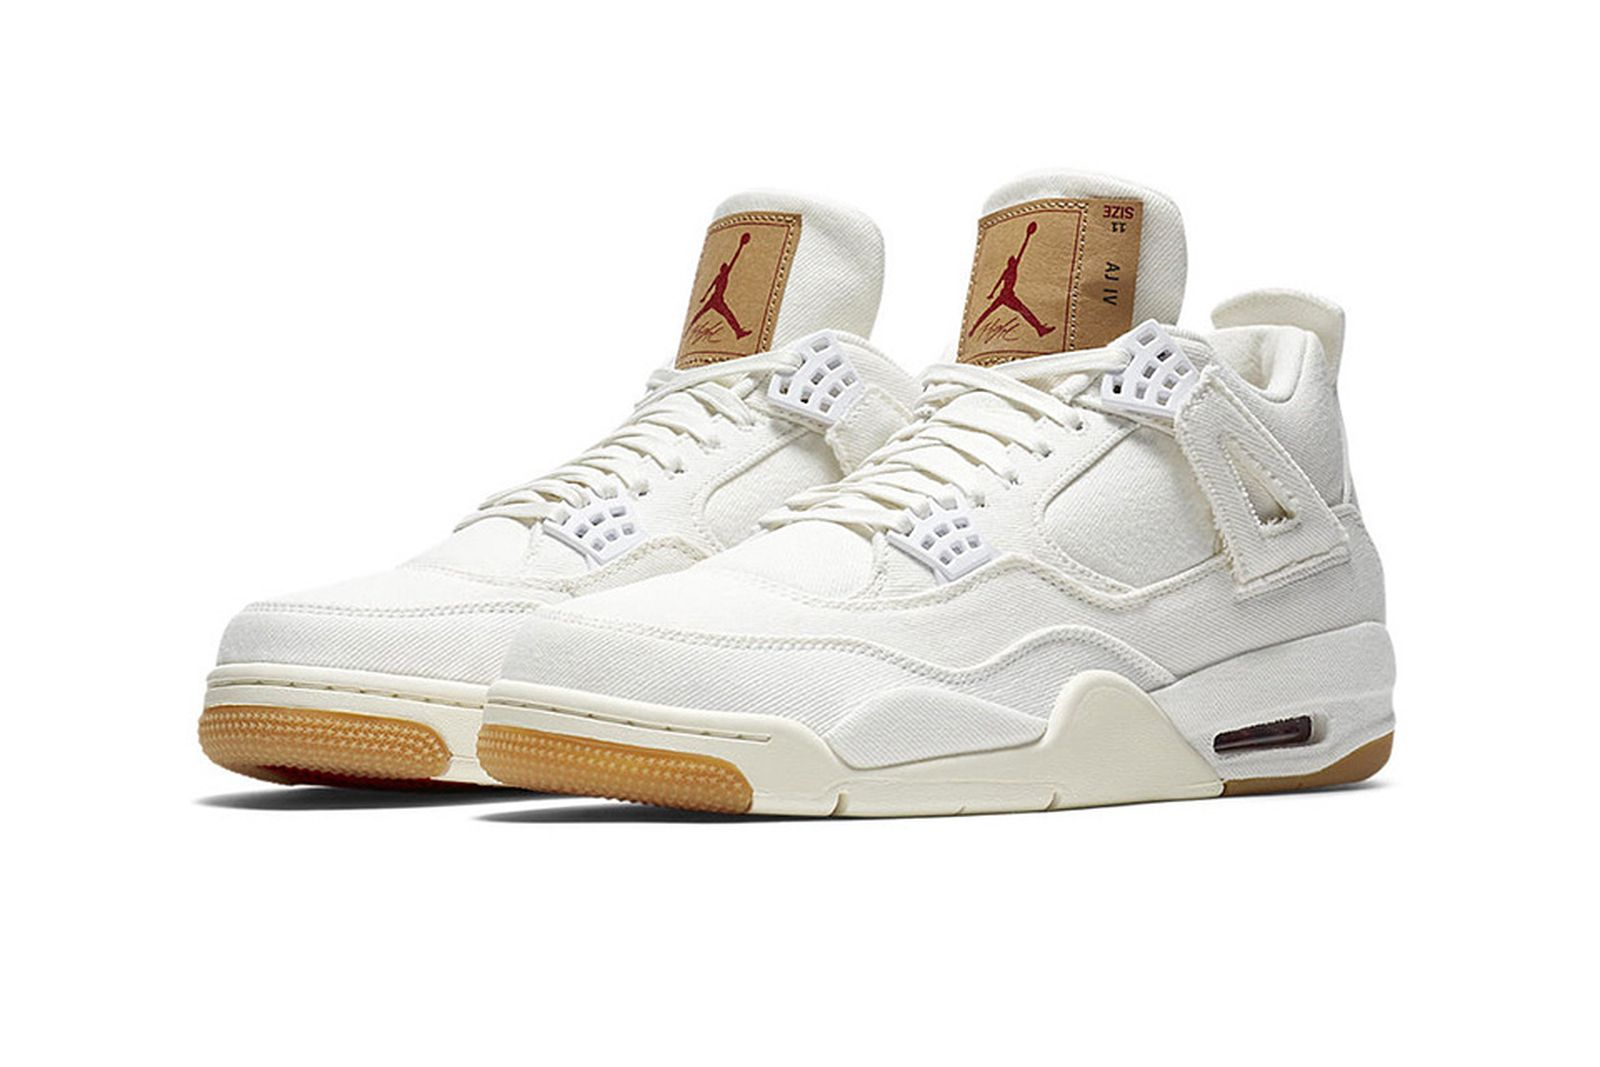 Teoría básica rasguño whisky  Levi's x Nike Air Jordan 4 White: Release Date, Price & More Info